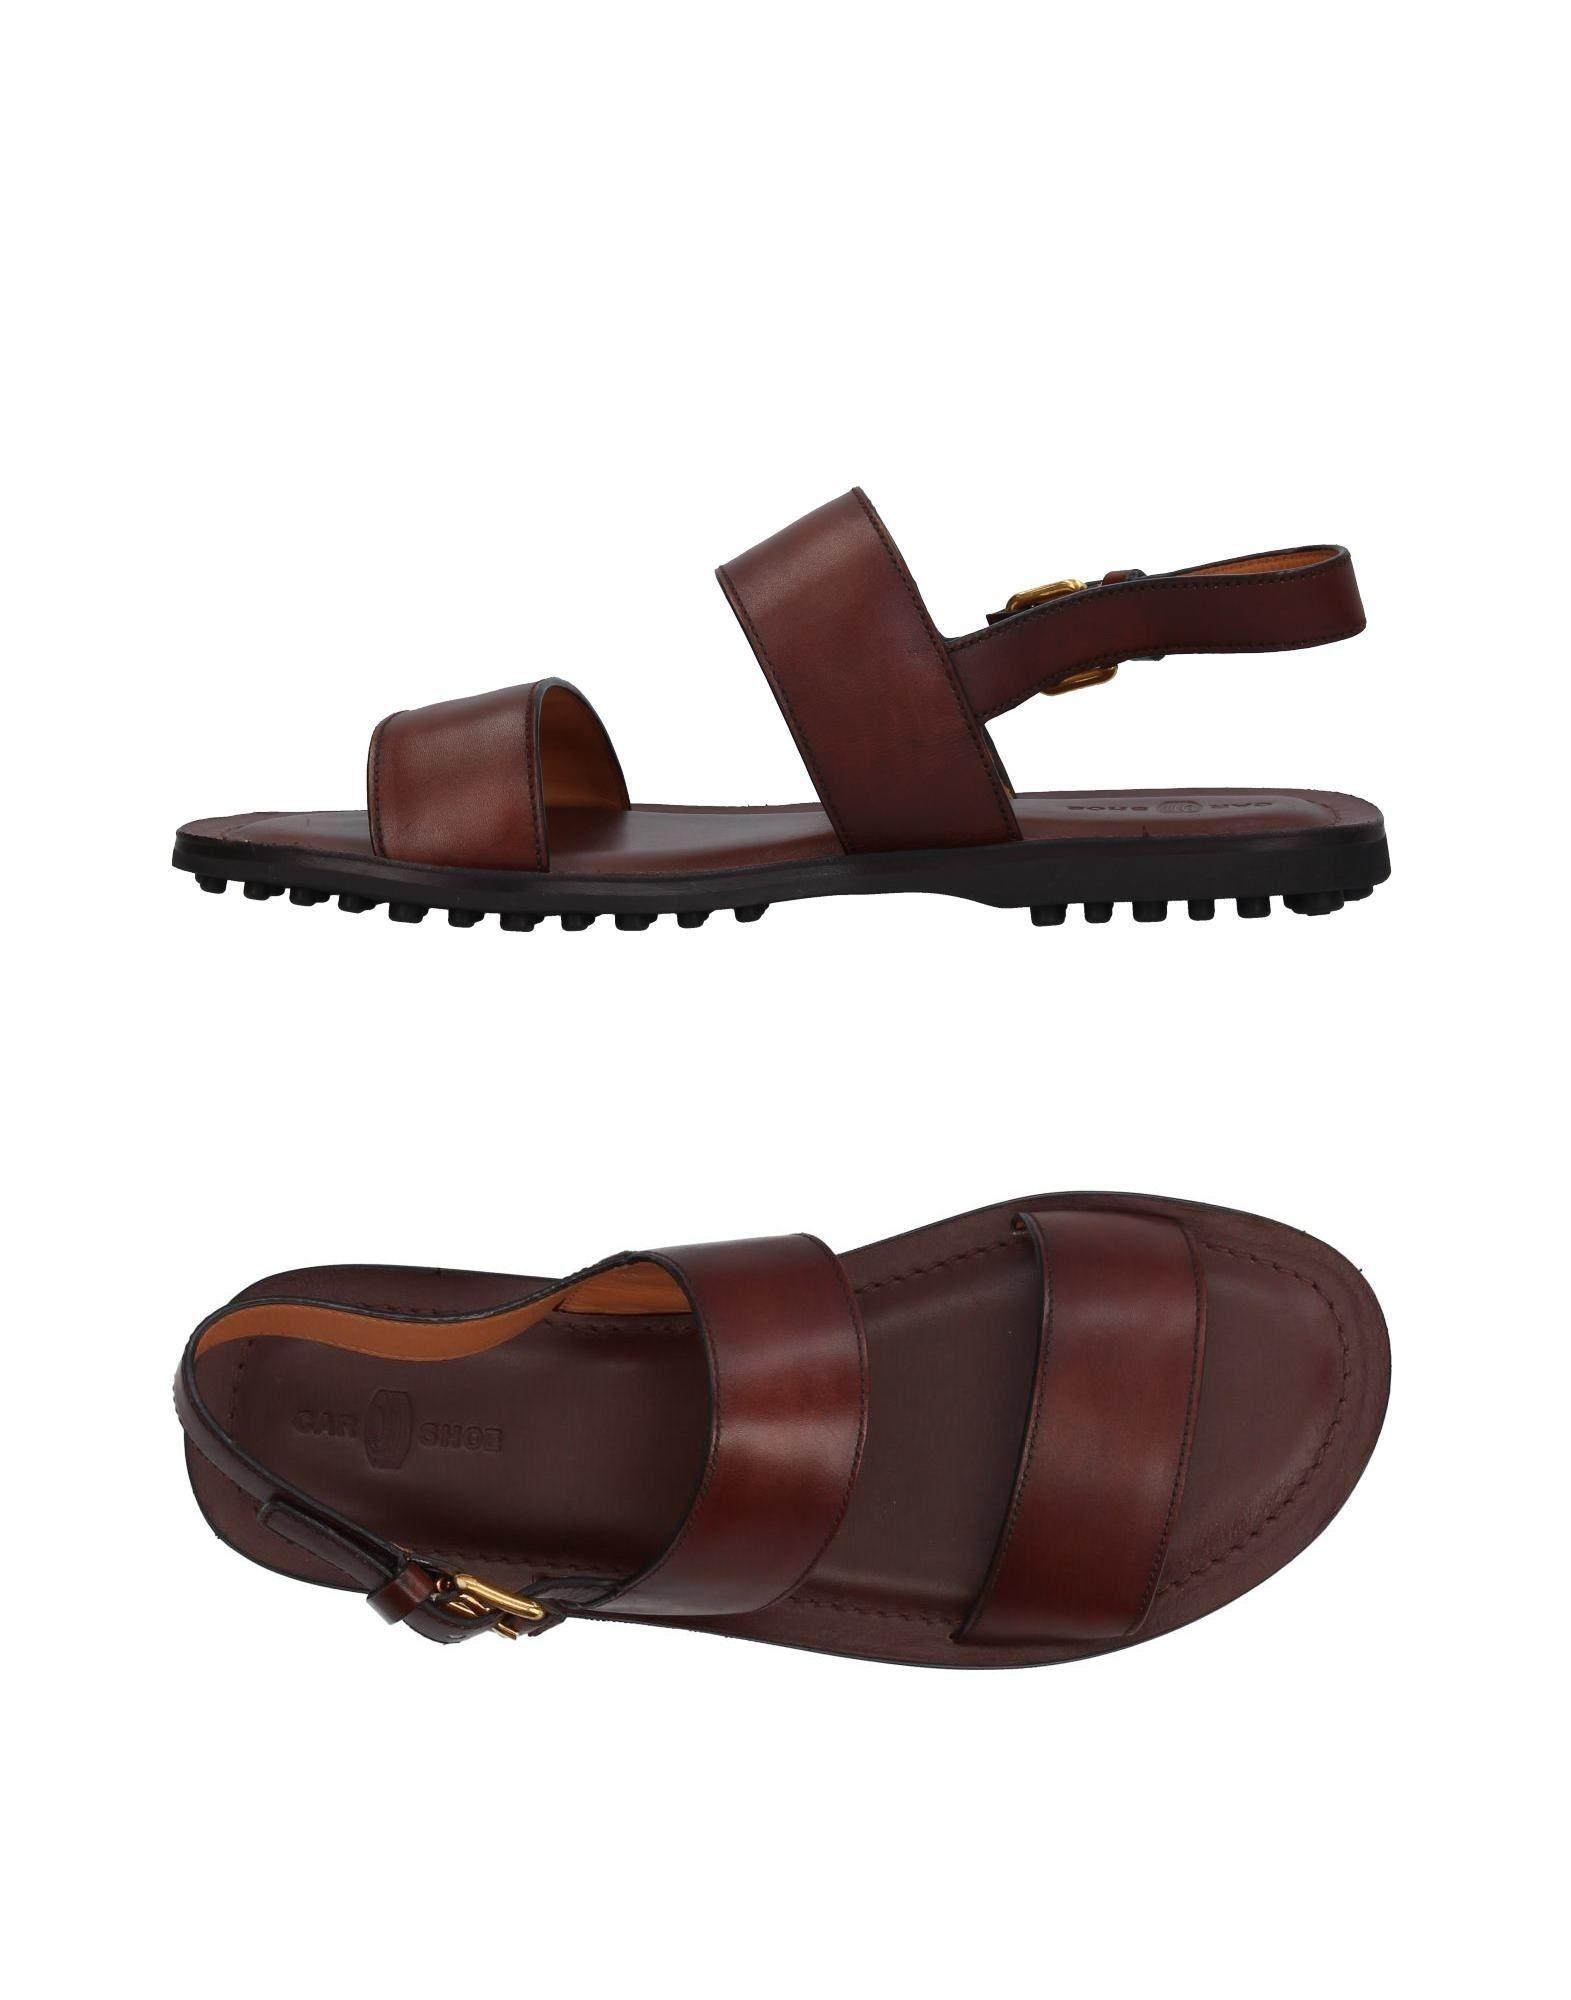 Carshoe Sandalen Herren  11374993QT Gute Qualität beliebte Schuhe